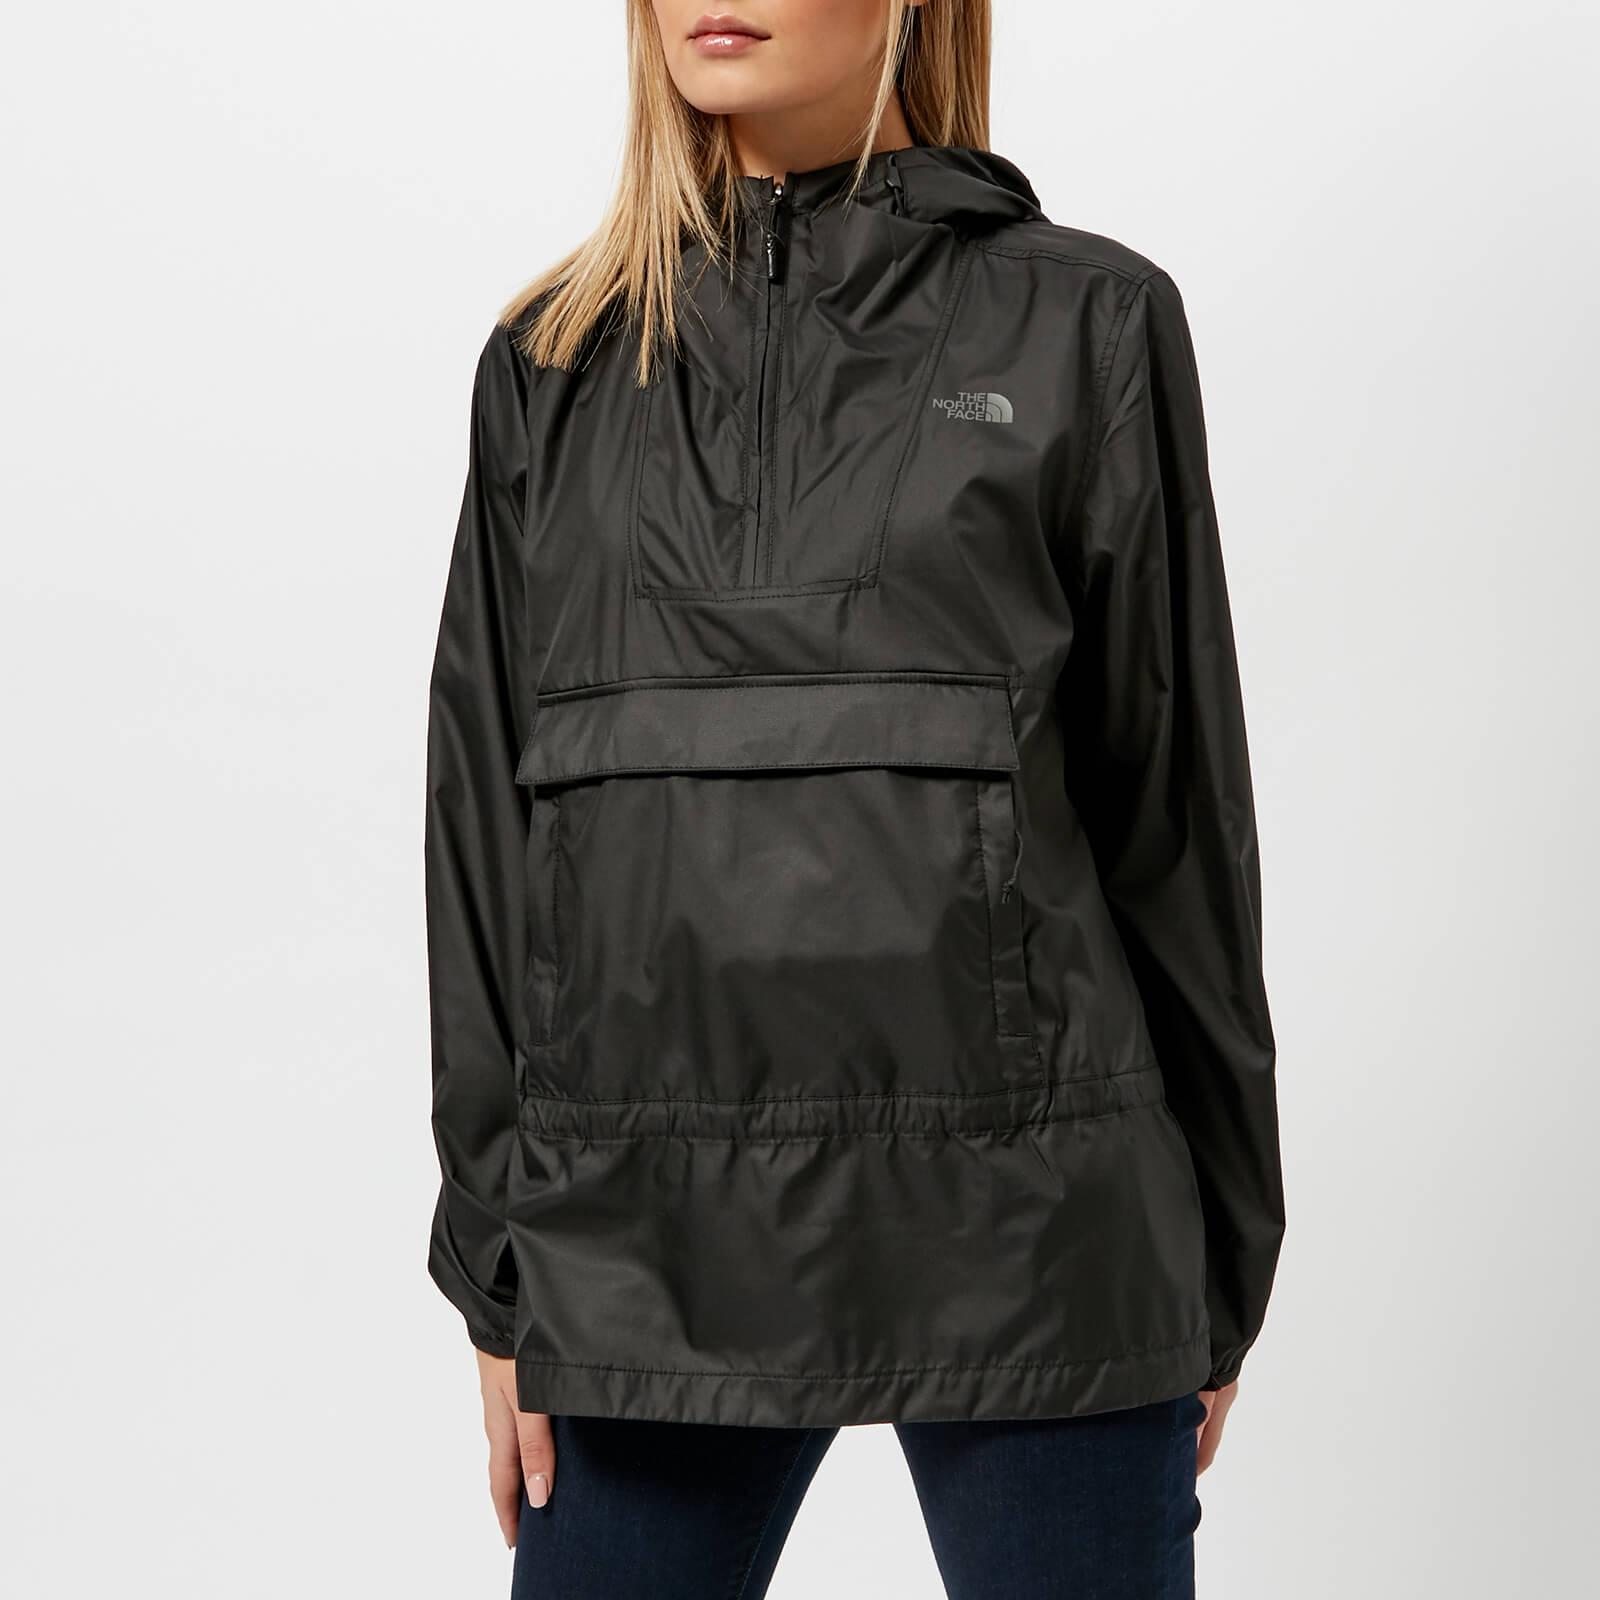 601d82fbe The North Face Women's Fanorak Jacket - TNF Black